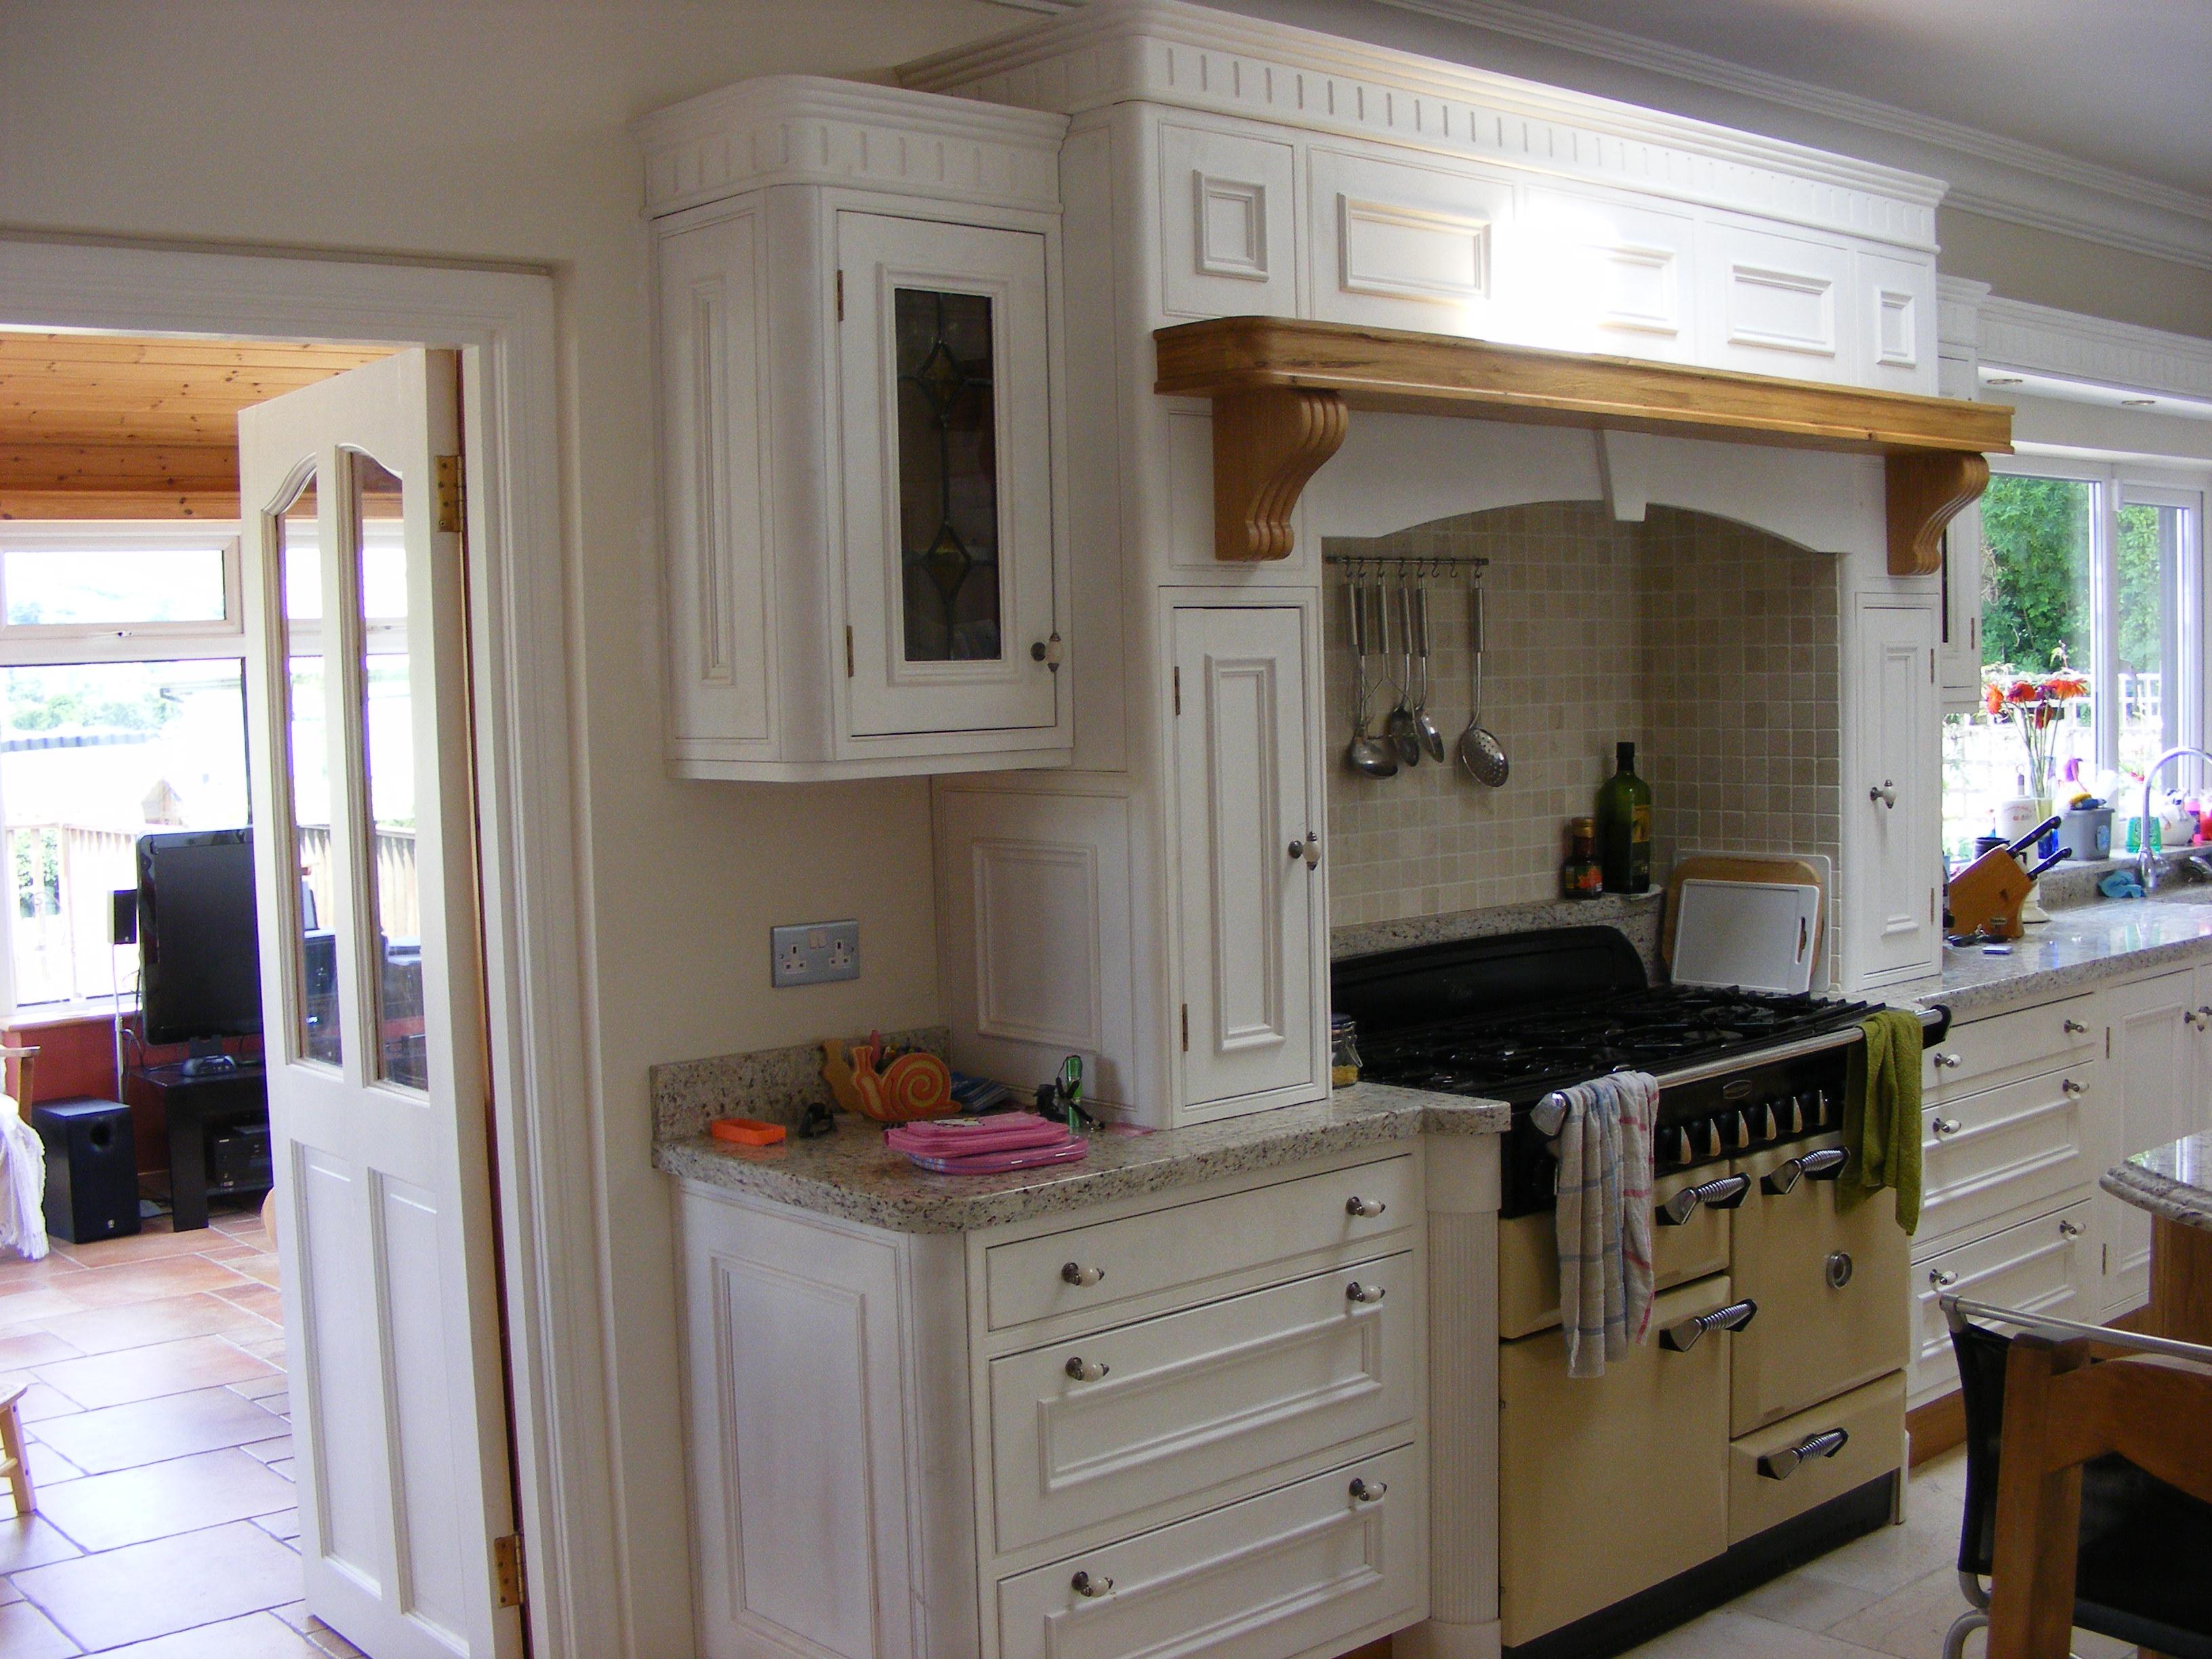 Kitchen Presses/Cooker Surrond